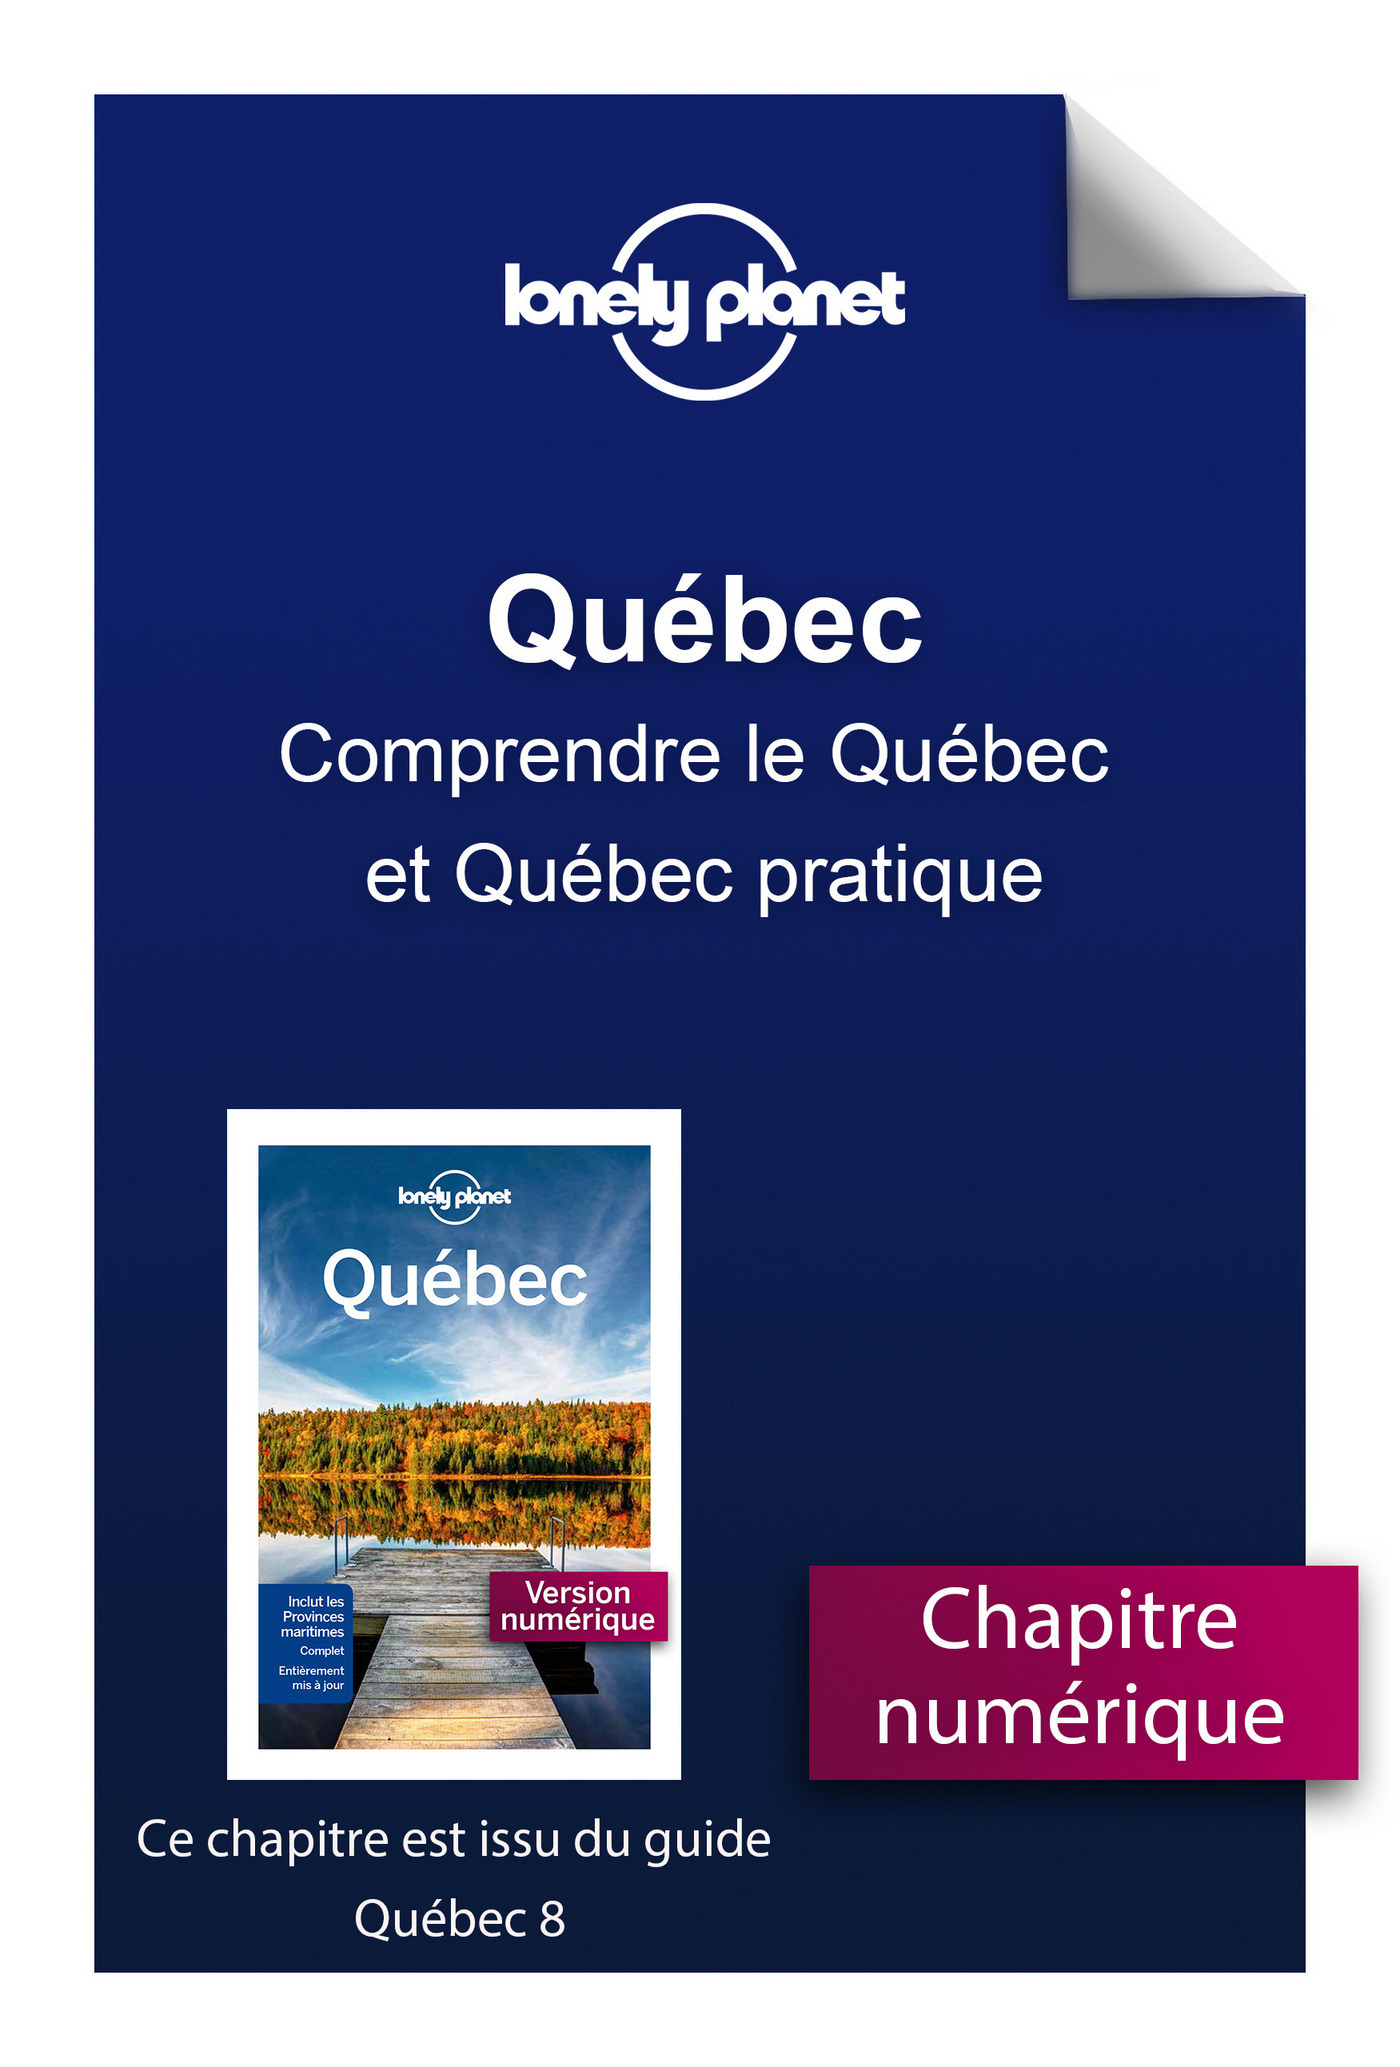 Québec - Comprendre le Québec et Québec pratique